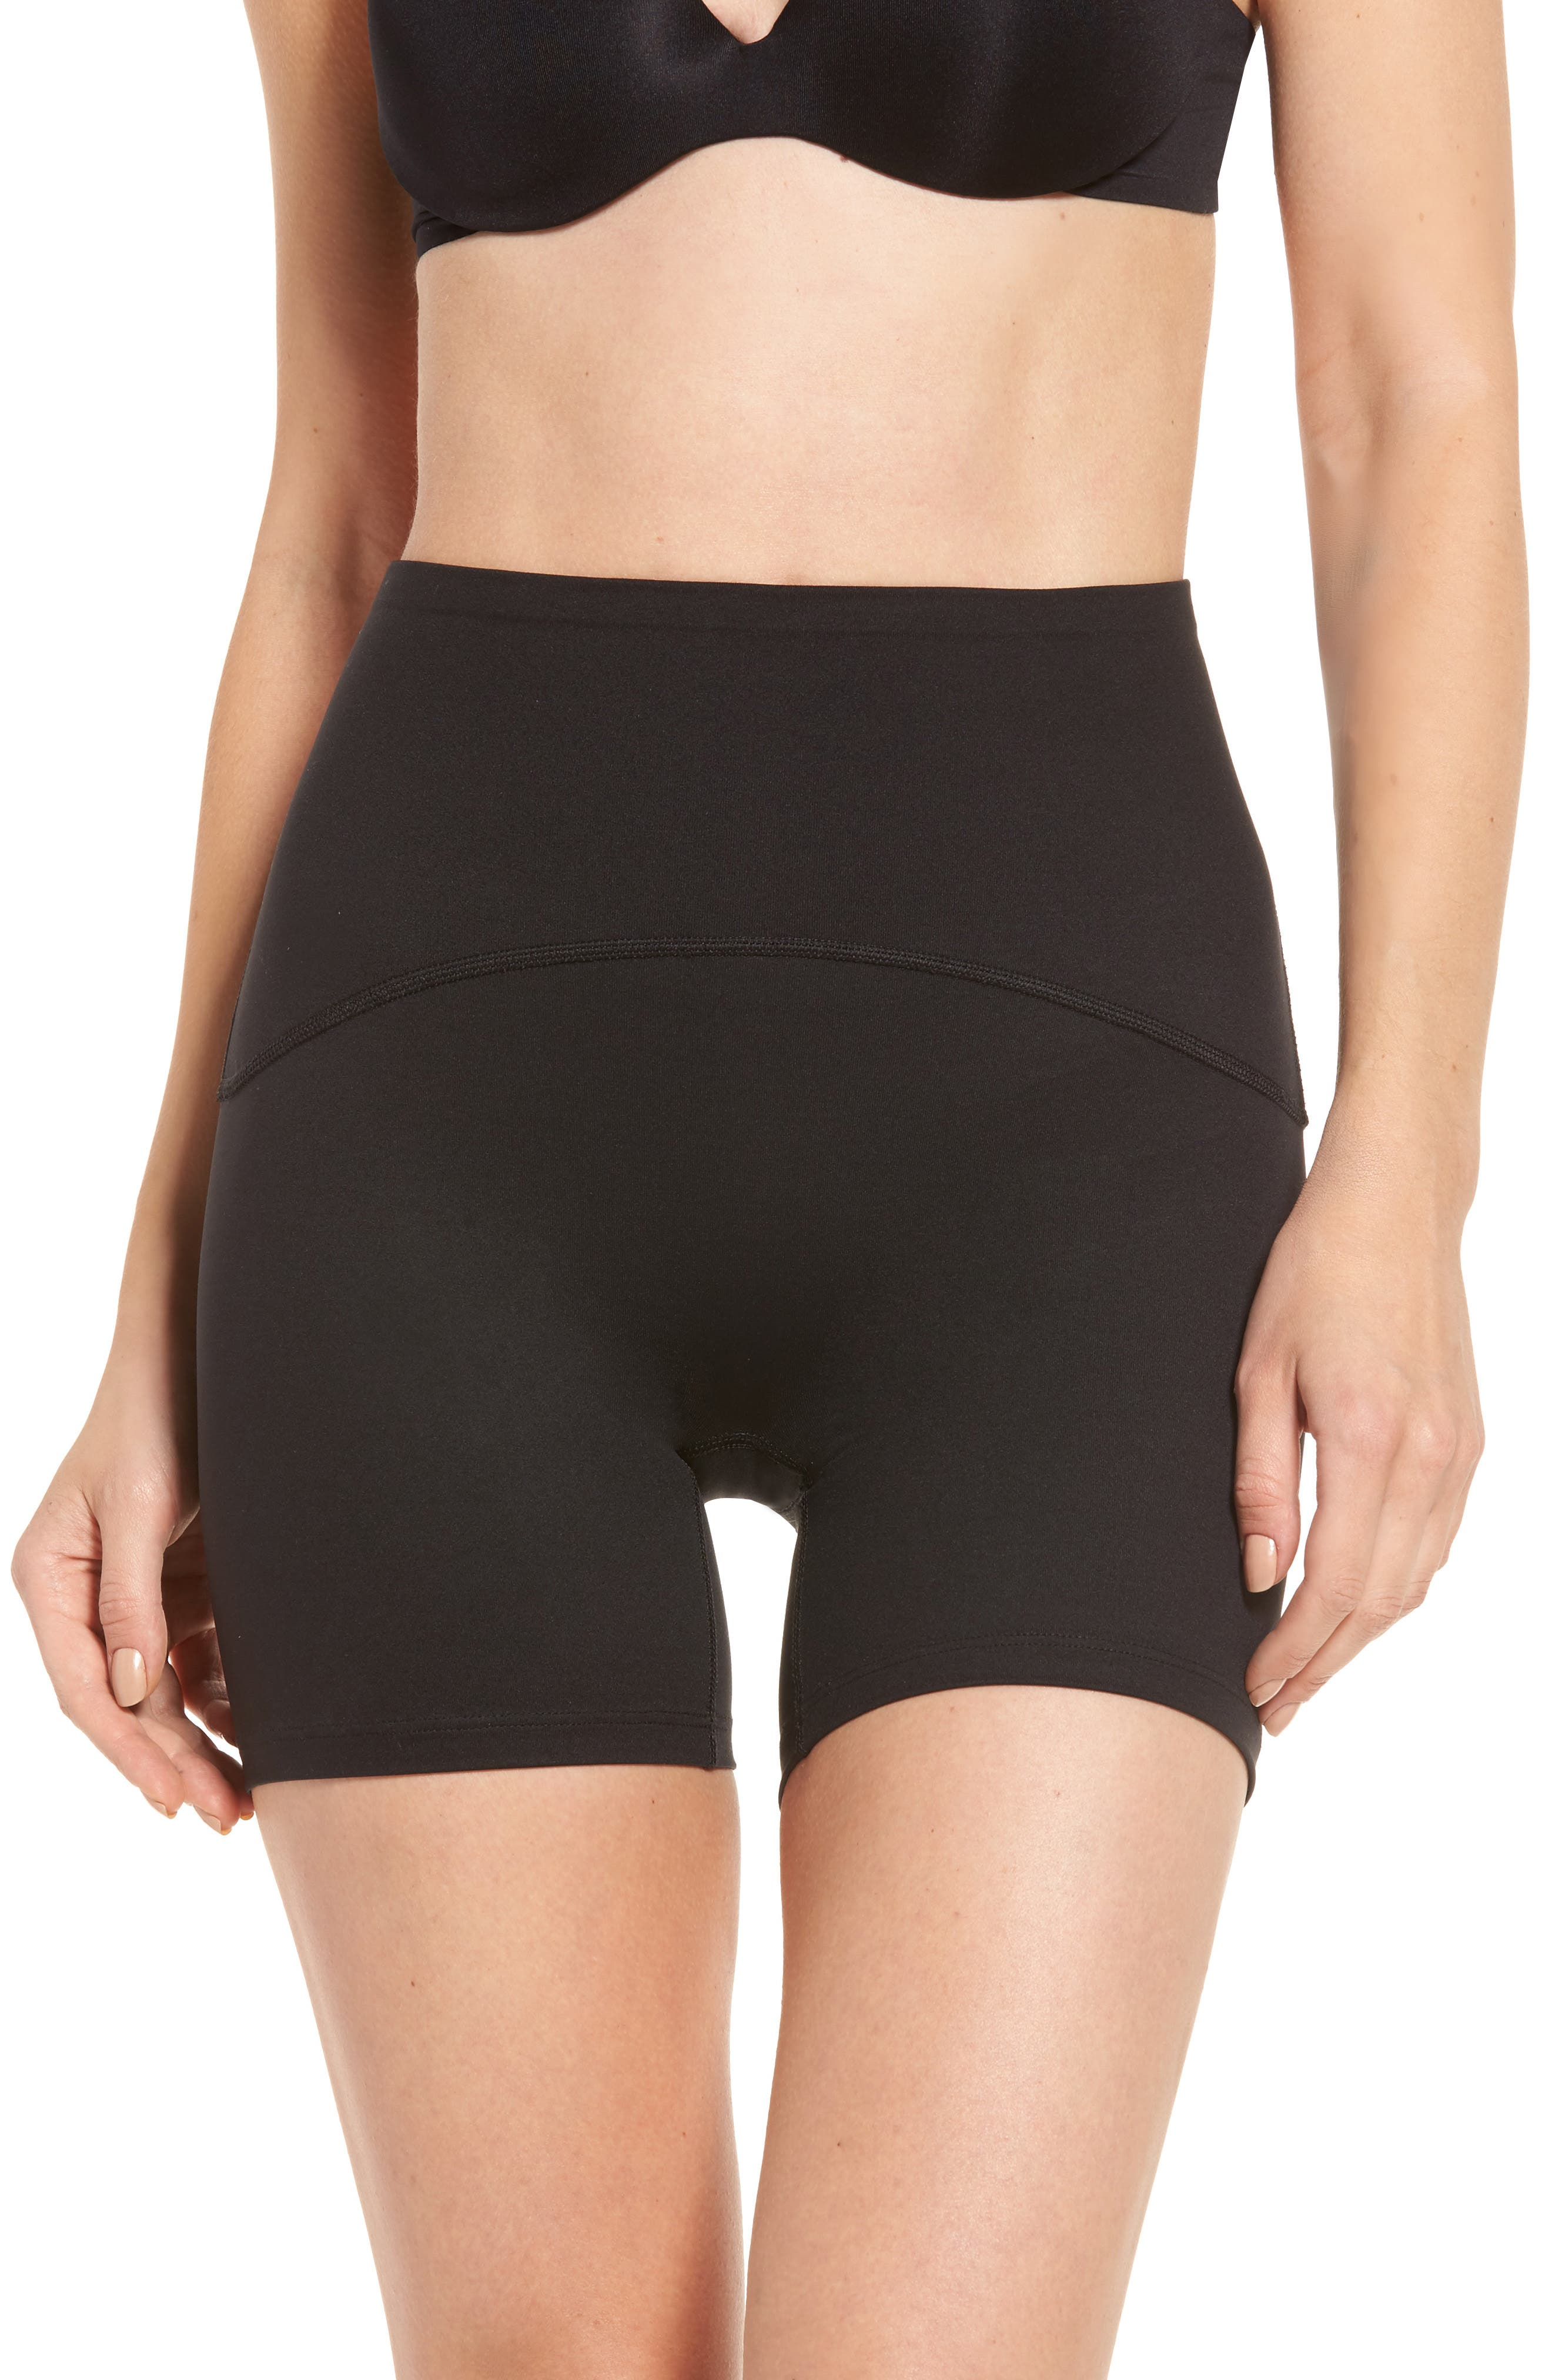 Sport Compression Shorts,                             Main thumbnail 1, color,                             BLACK